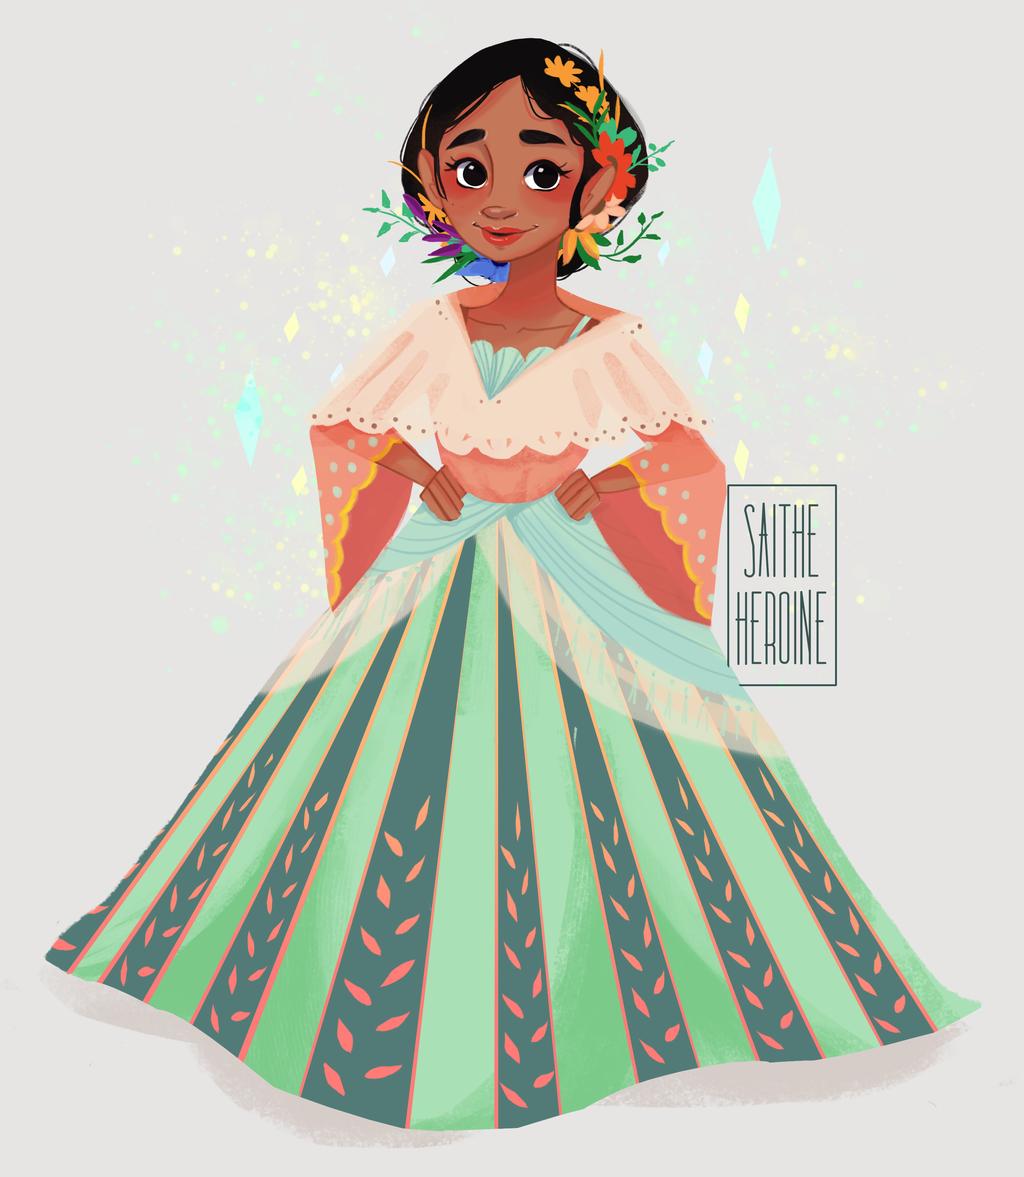 Dress clipart filipiniana Saitheheroine Filipiniana saitheheroine by Pastel